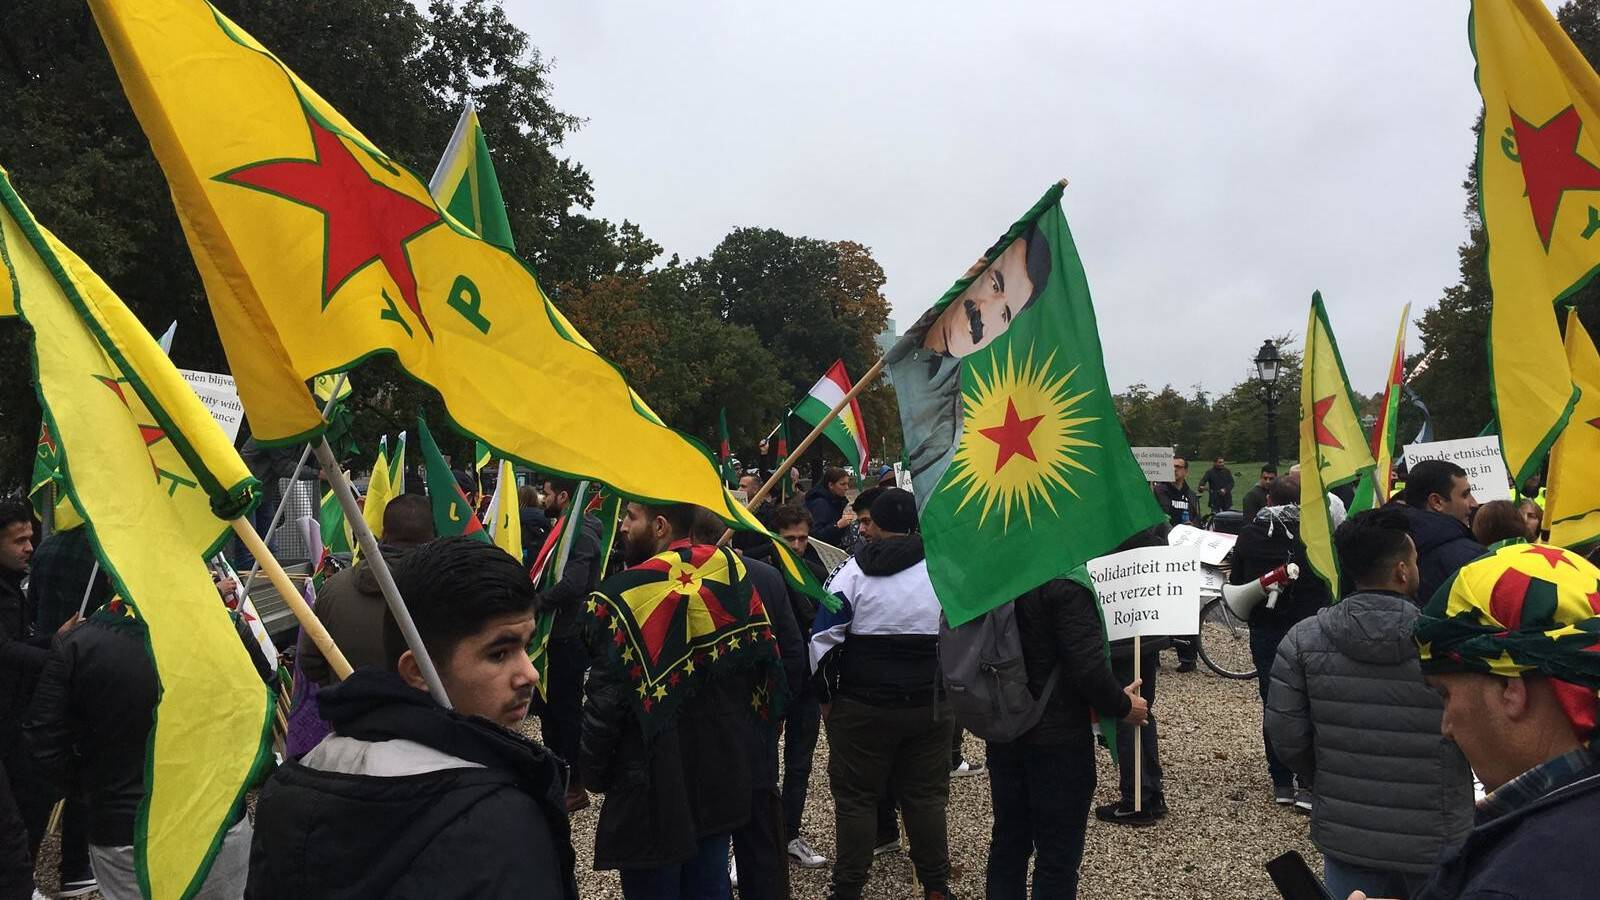 Dutch-Kurdish demonstrators arriving in The Hague today, NOS photo